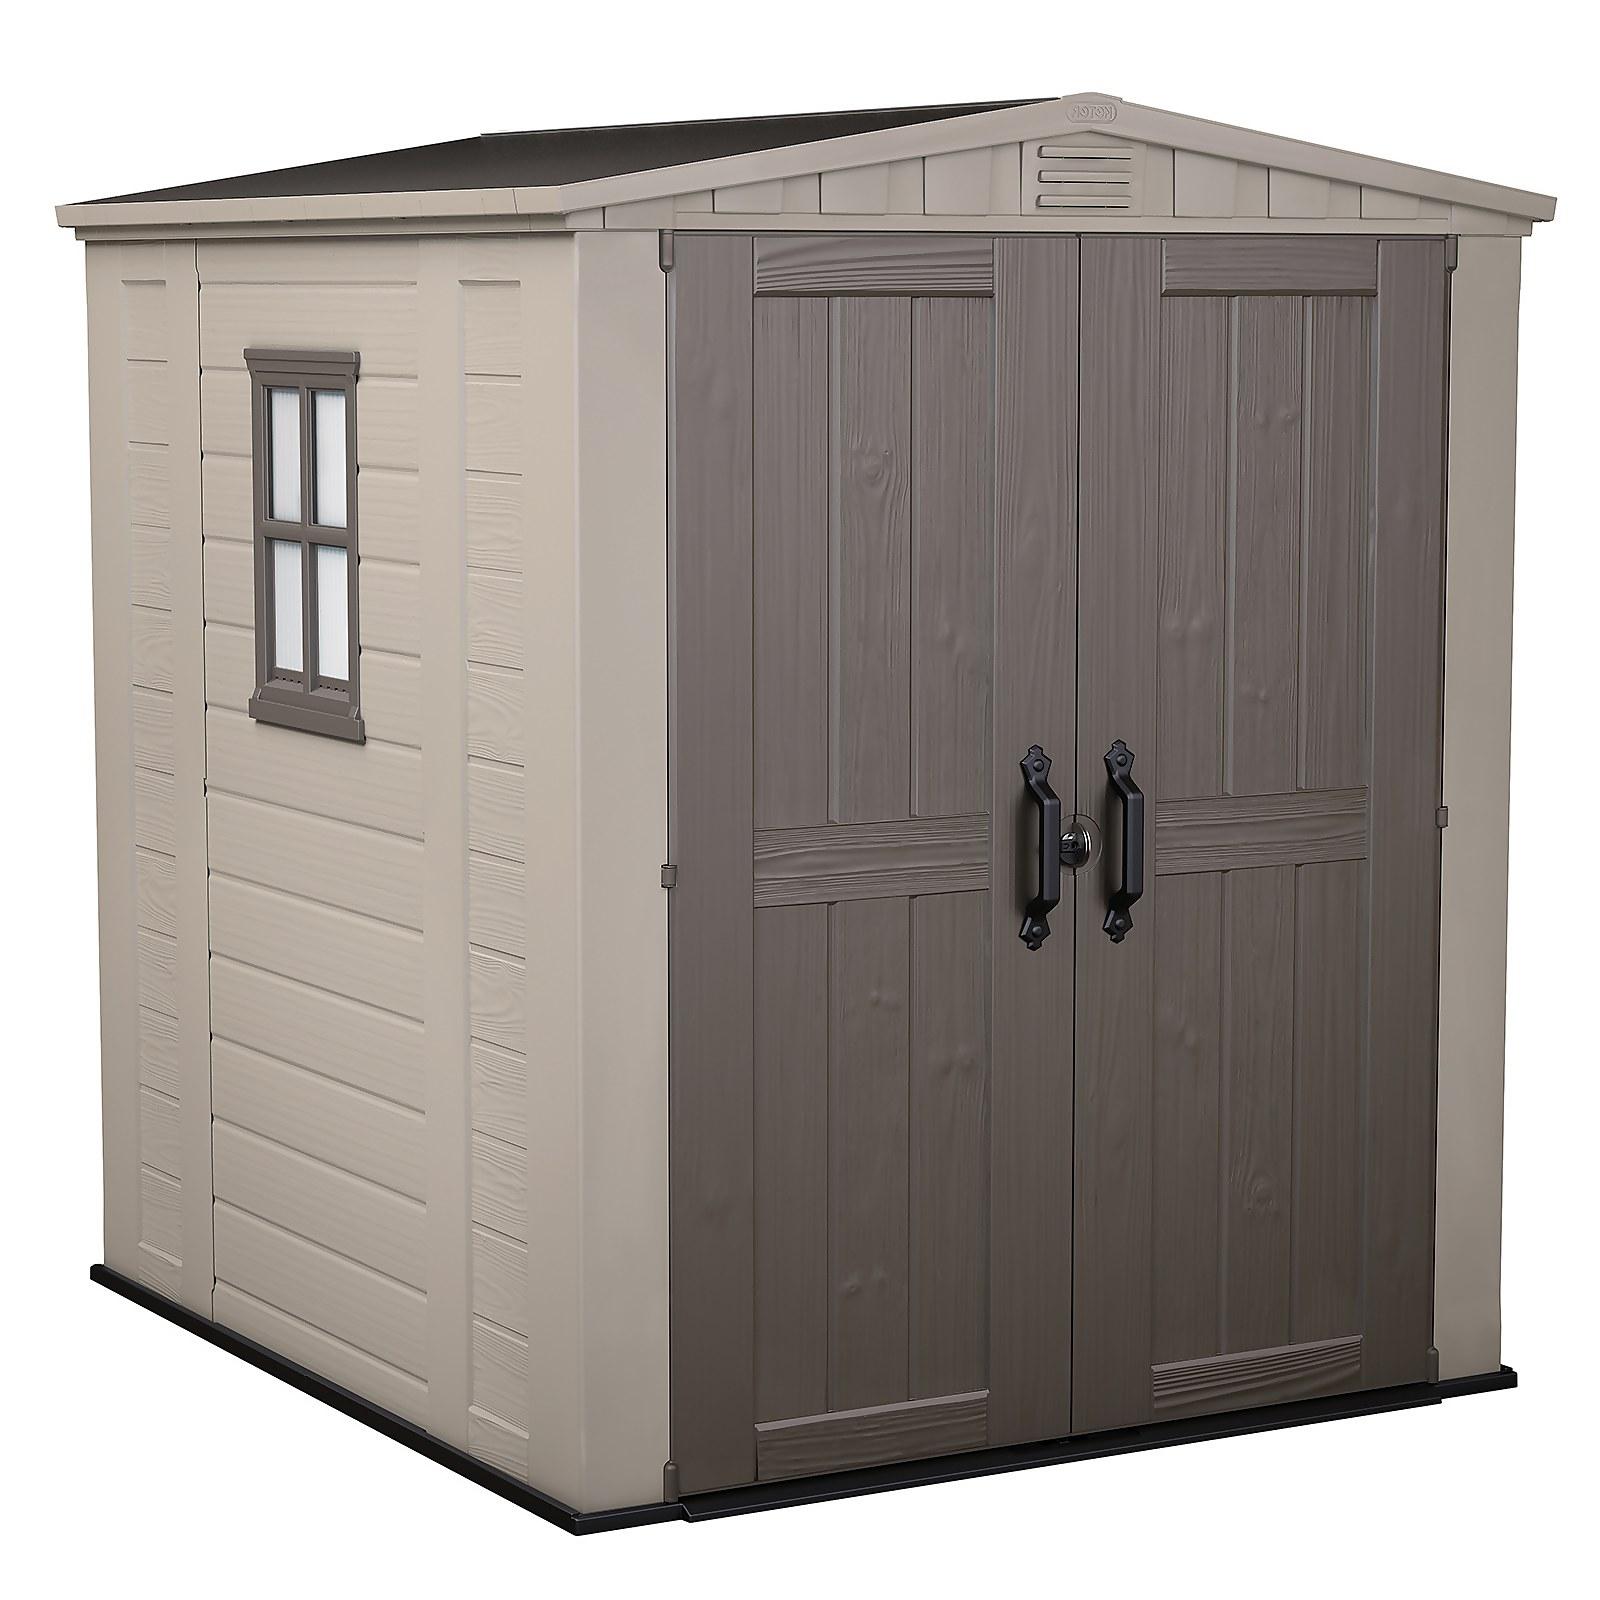 Keter Factor 6 x 6ft Outdoor Garden Apex Storage Shed - Beige/Brown